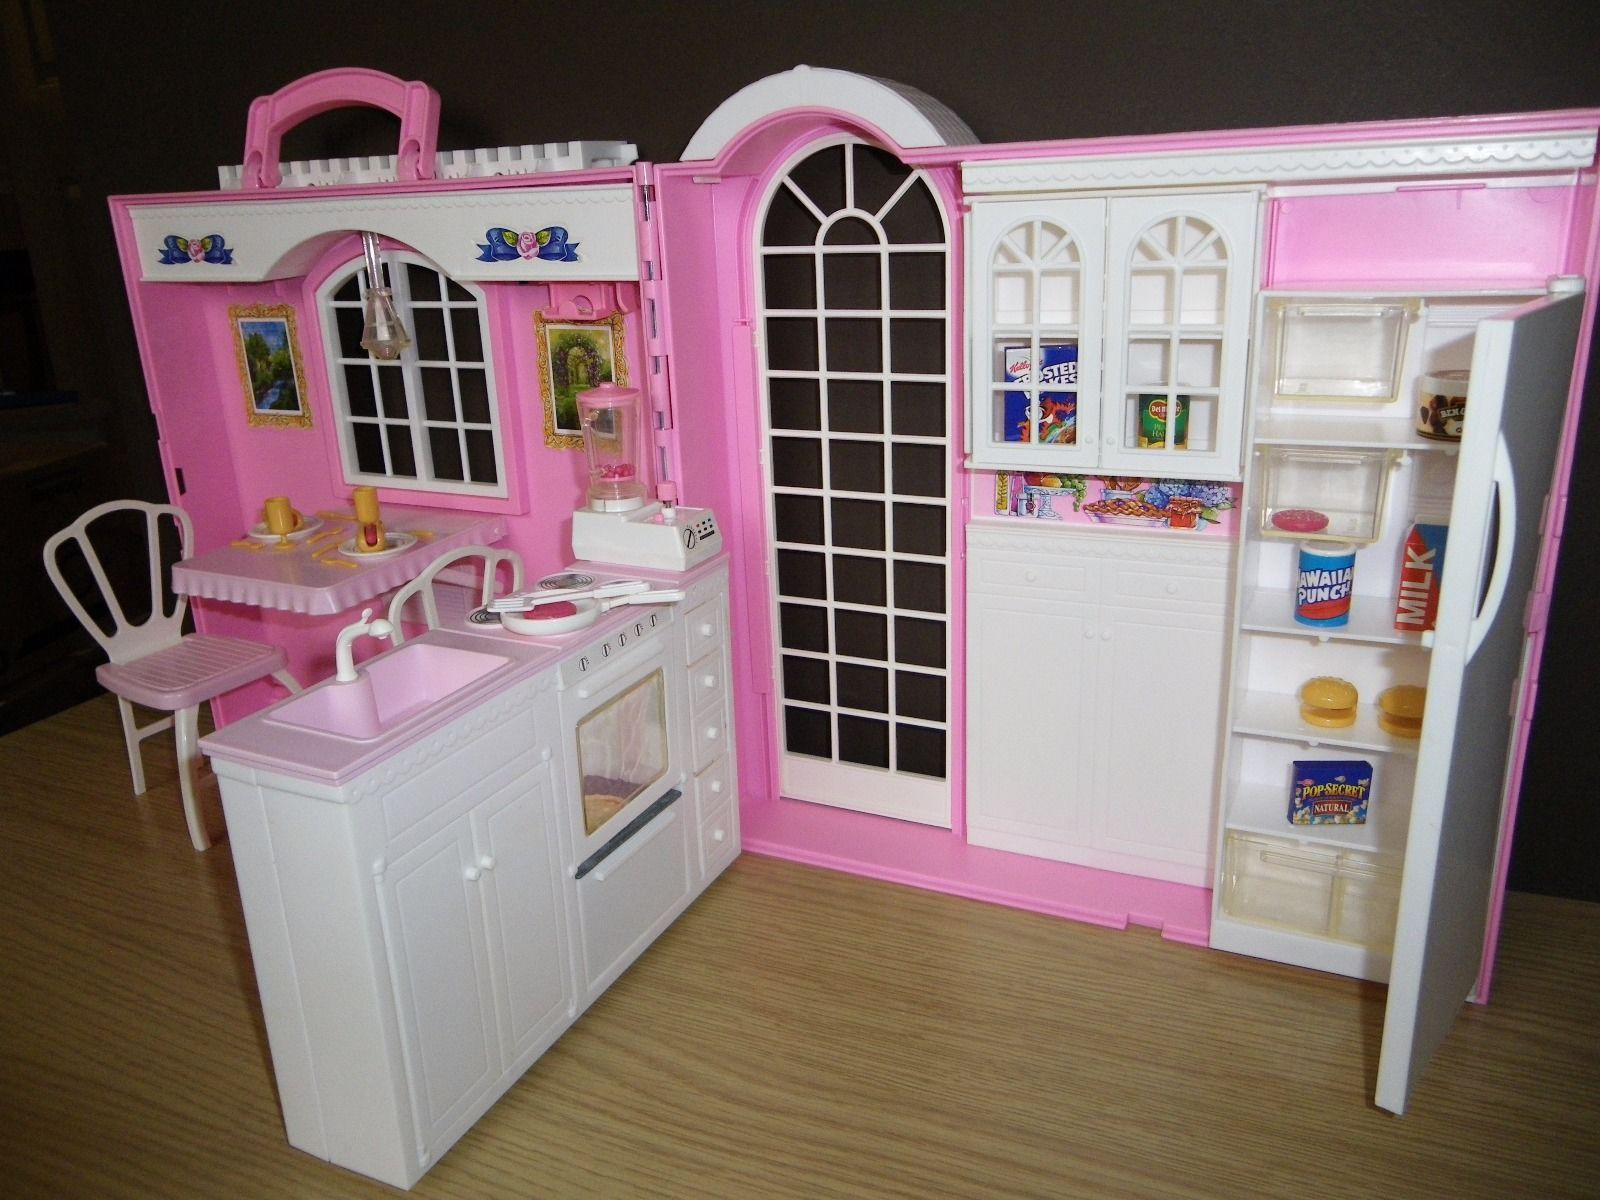 1998 Barbie Magic Kitchen Playset Barbie Magic